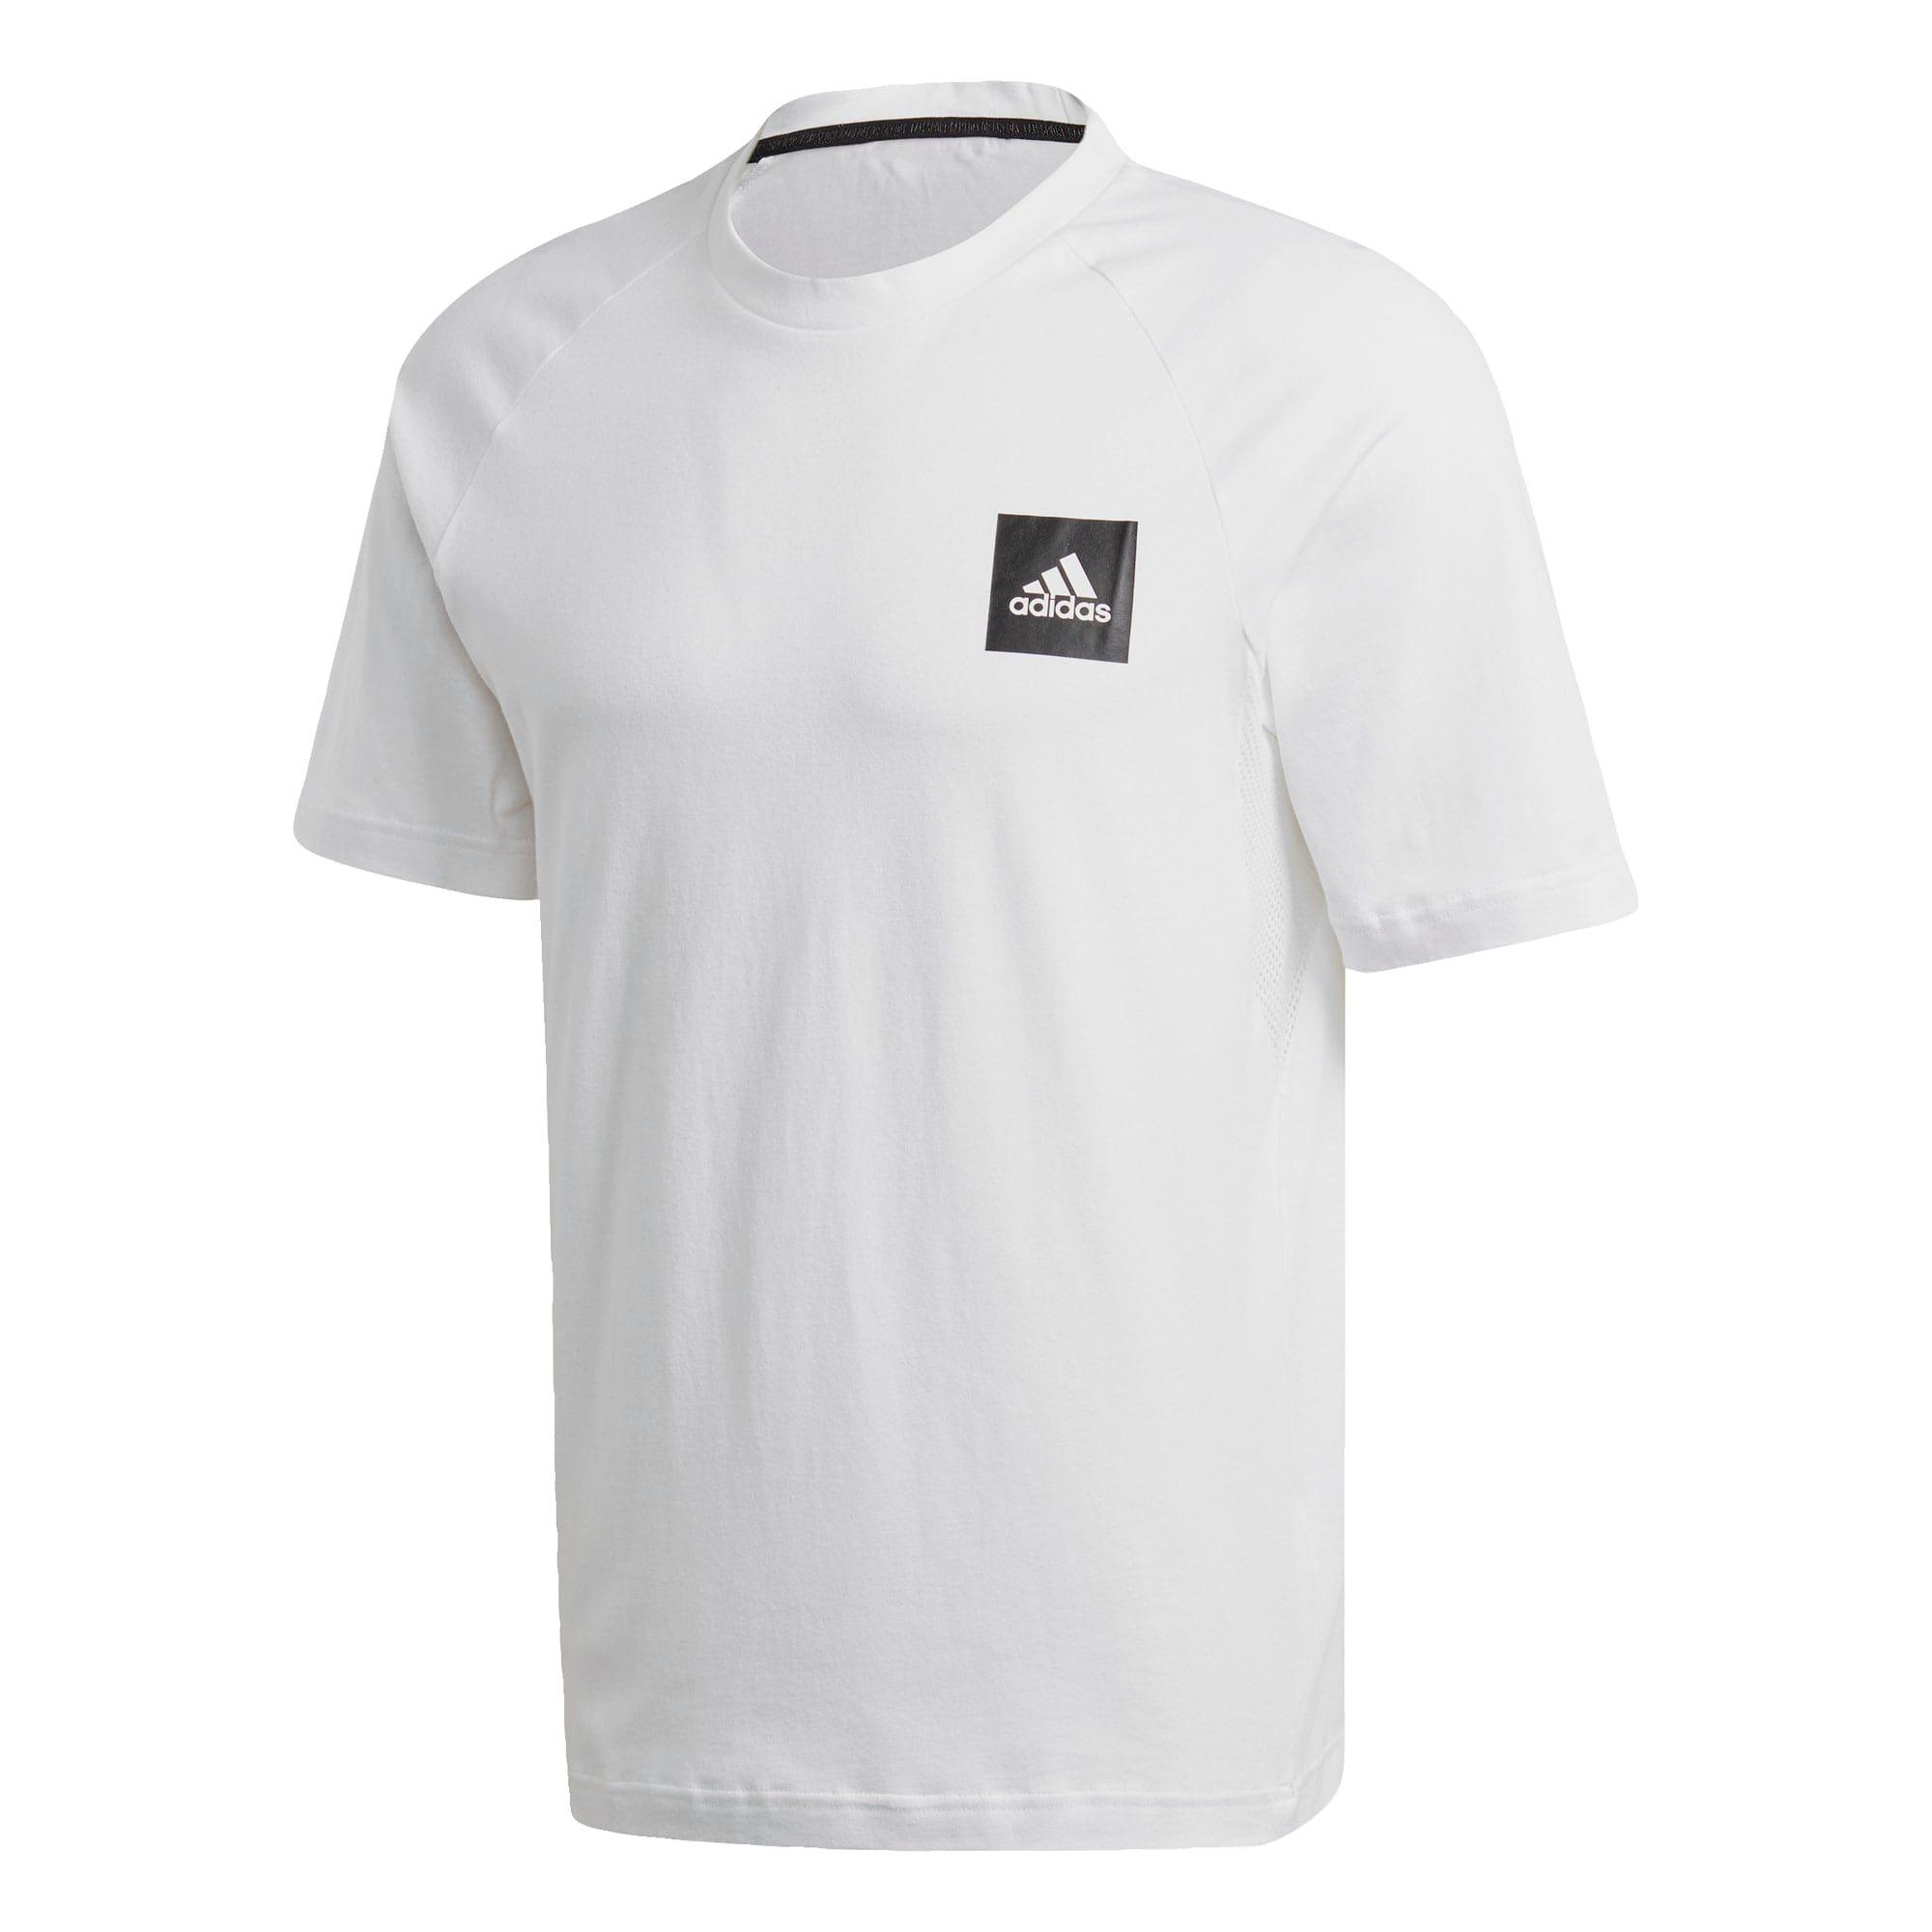 Adidas Performance T Shirt Herren Schwarz Weiss Grosse Xs T Shirt Manner Shirts Und T Shirt